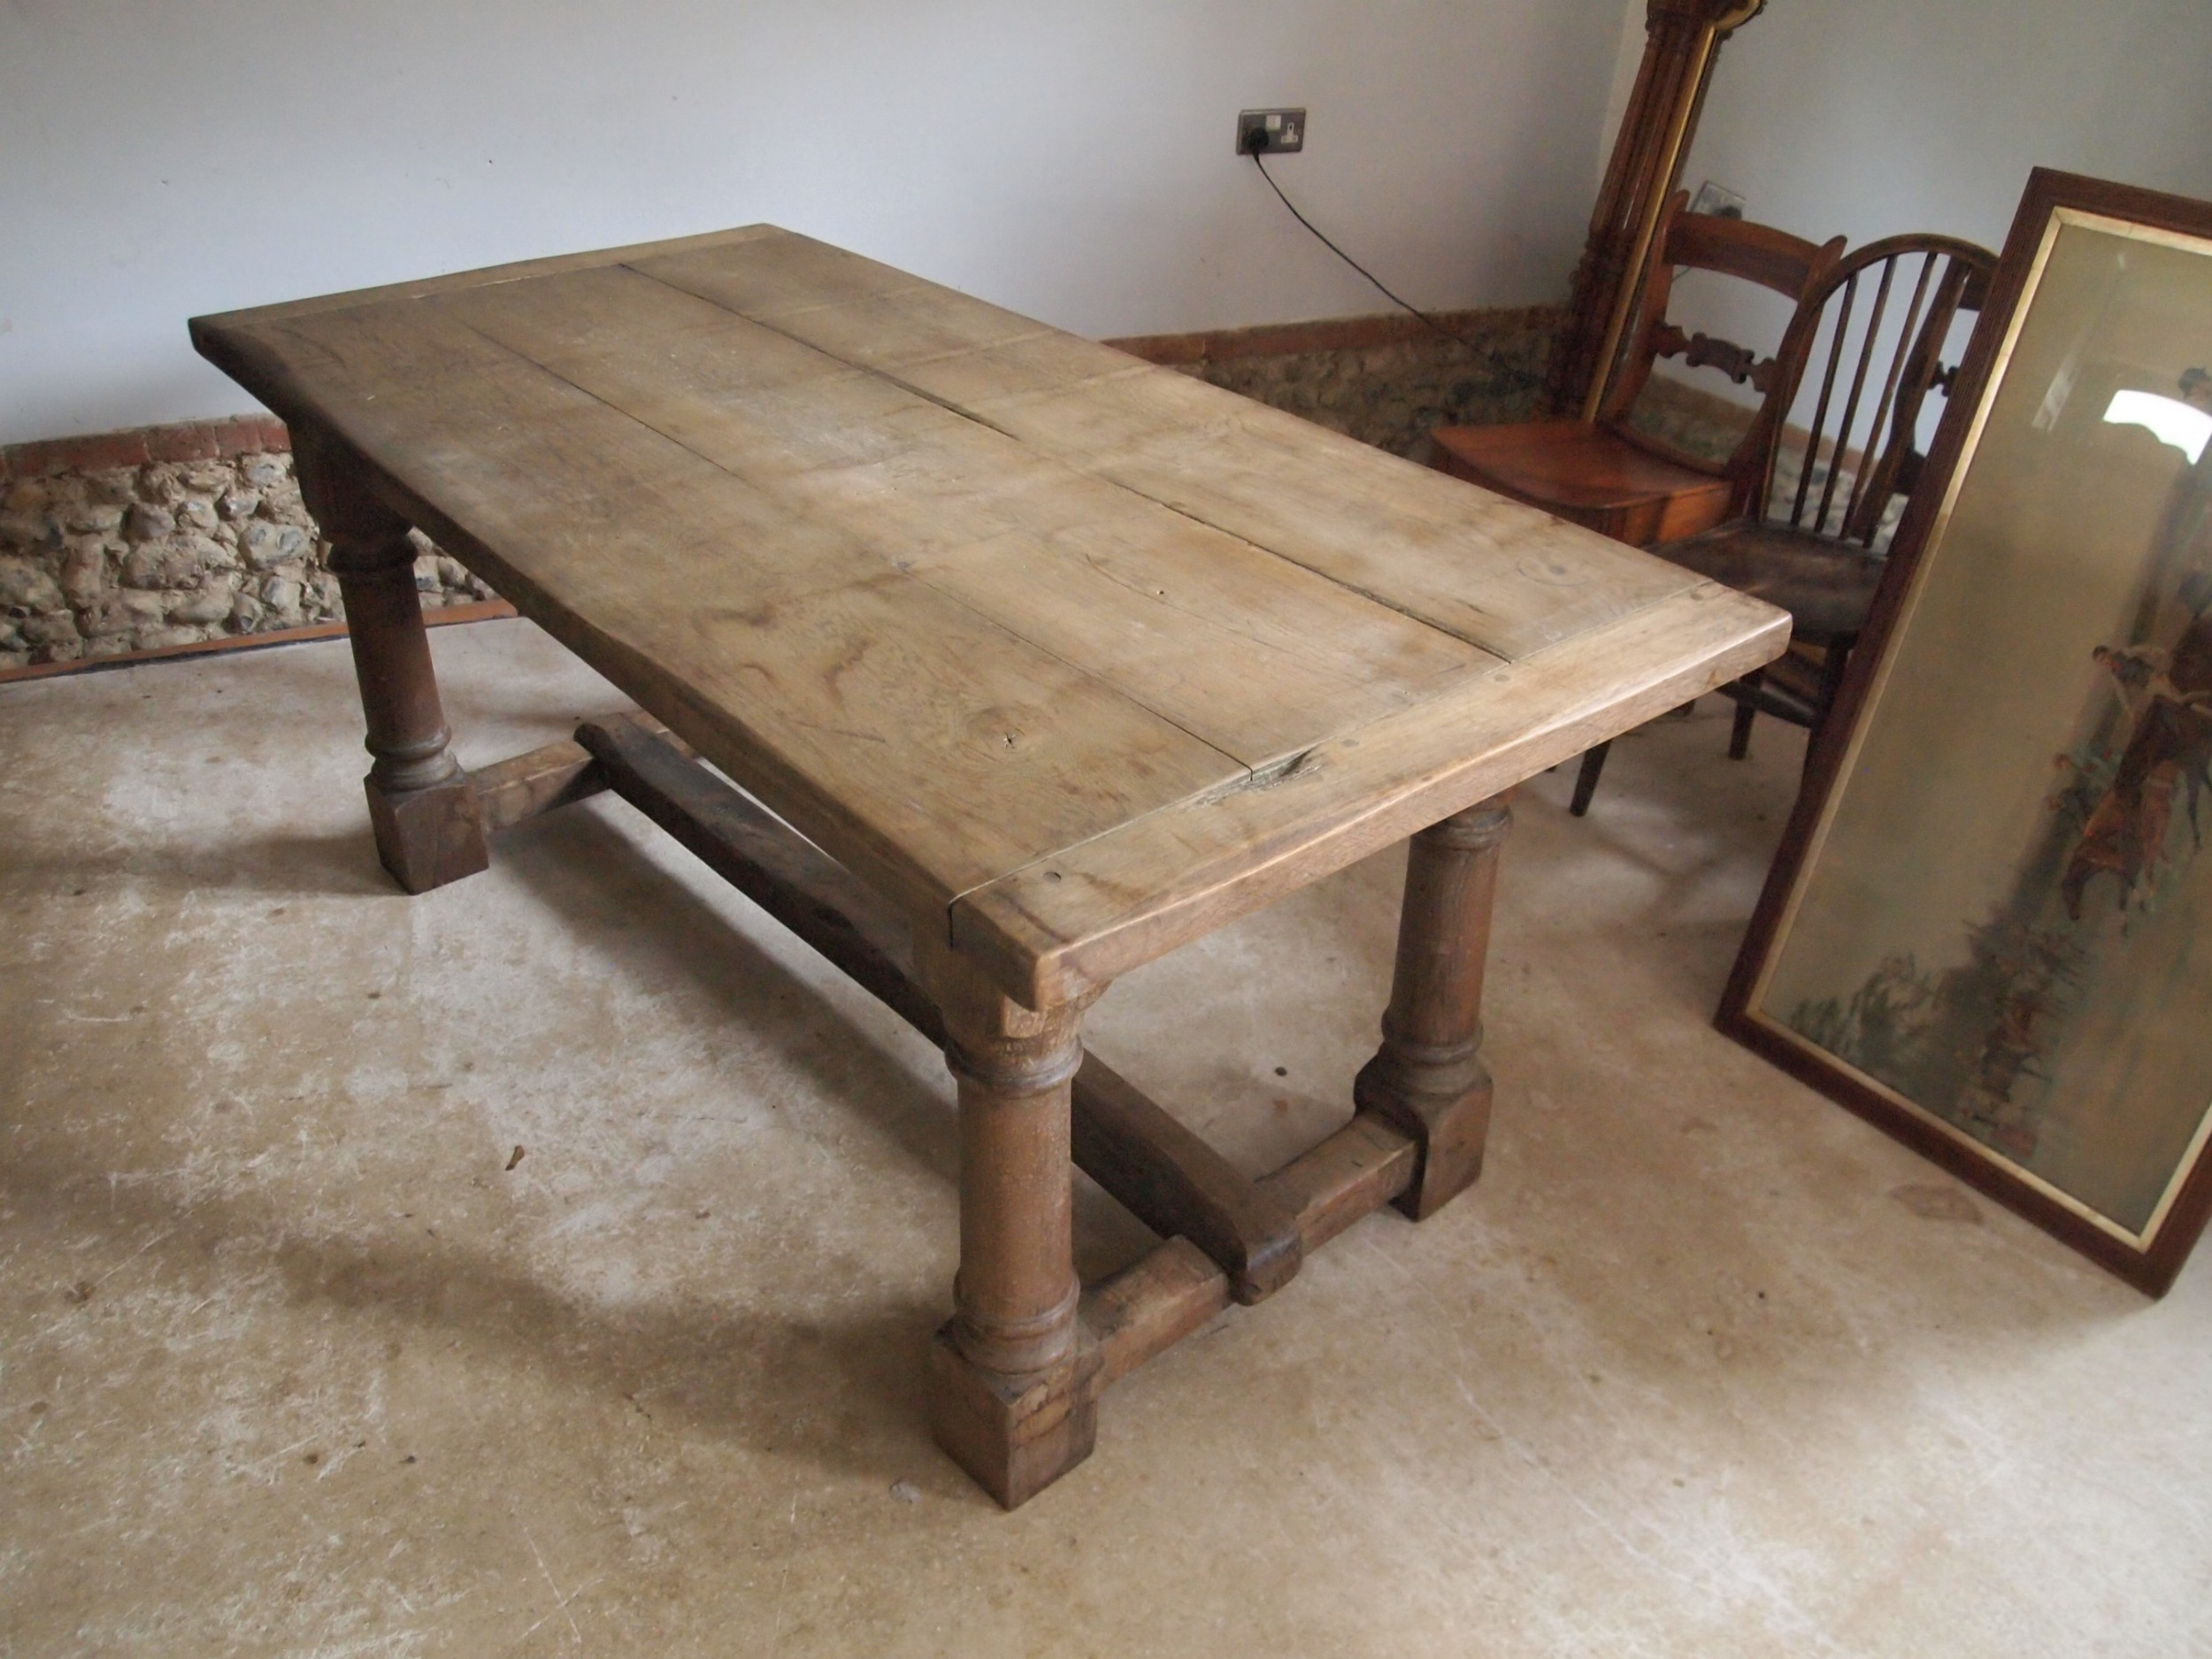 table refectory farmhouse dining rustic oak 68 c1900